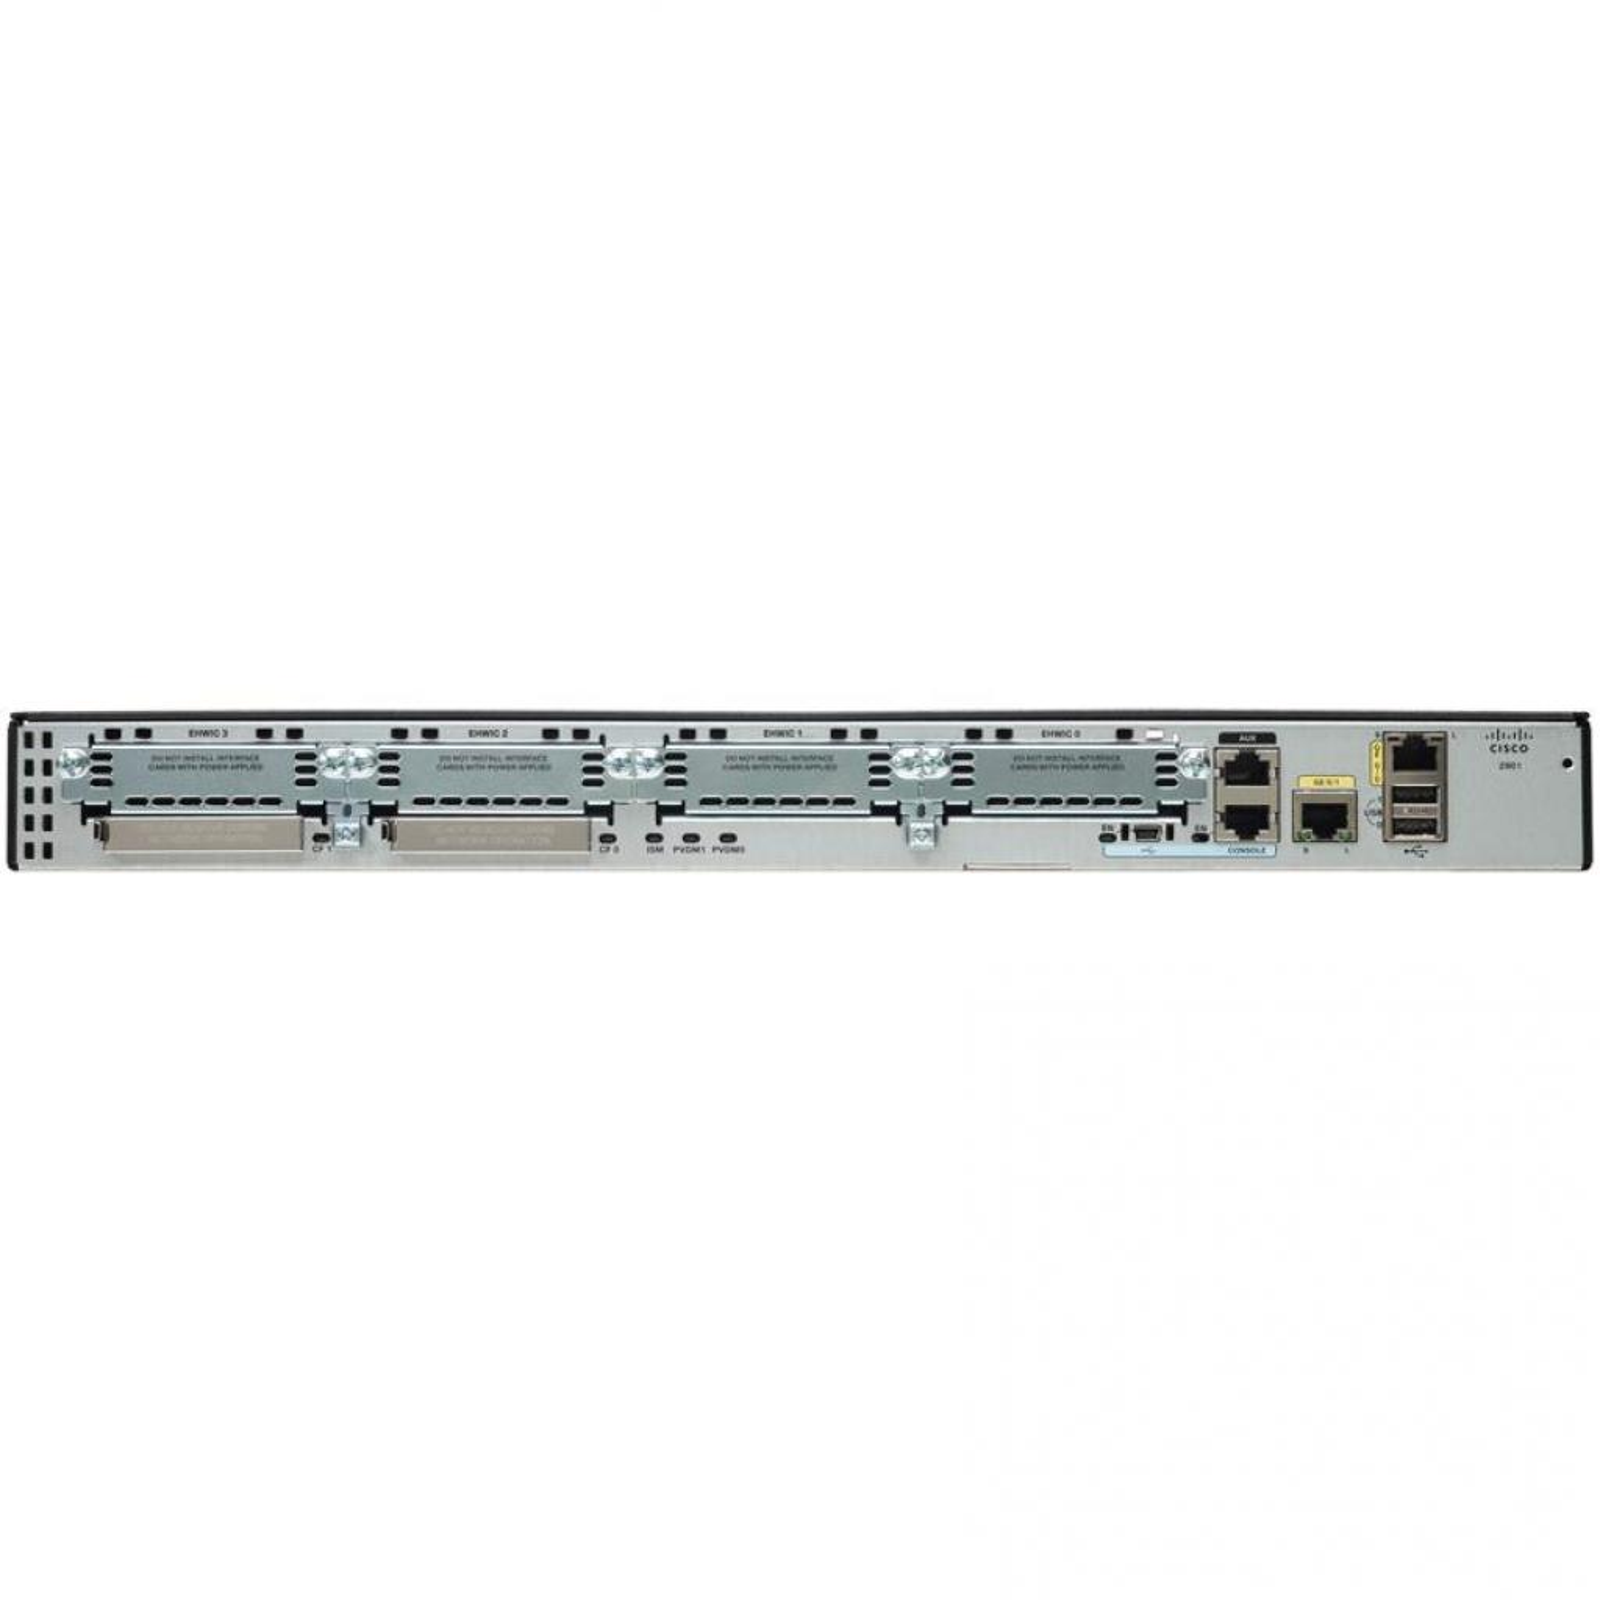 Маршрутизатор Cisco CISCO2901/K9 изображение 2